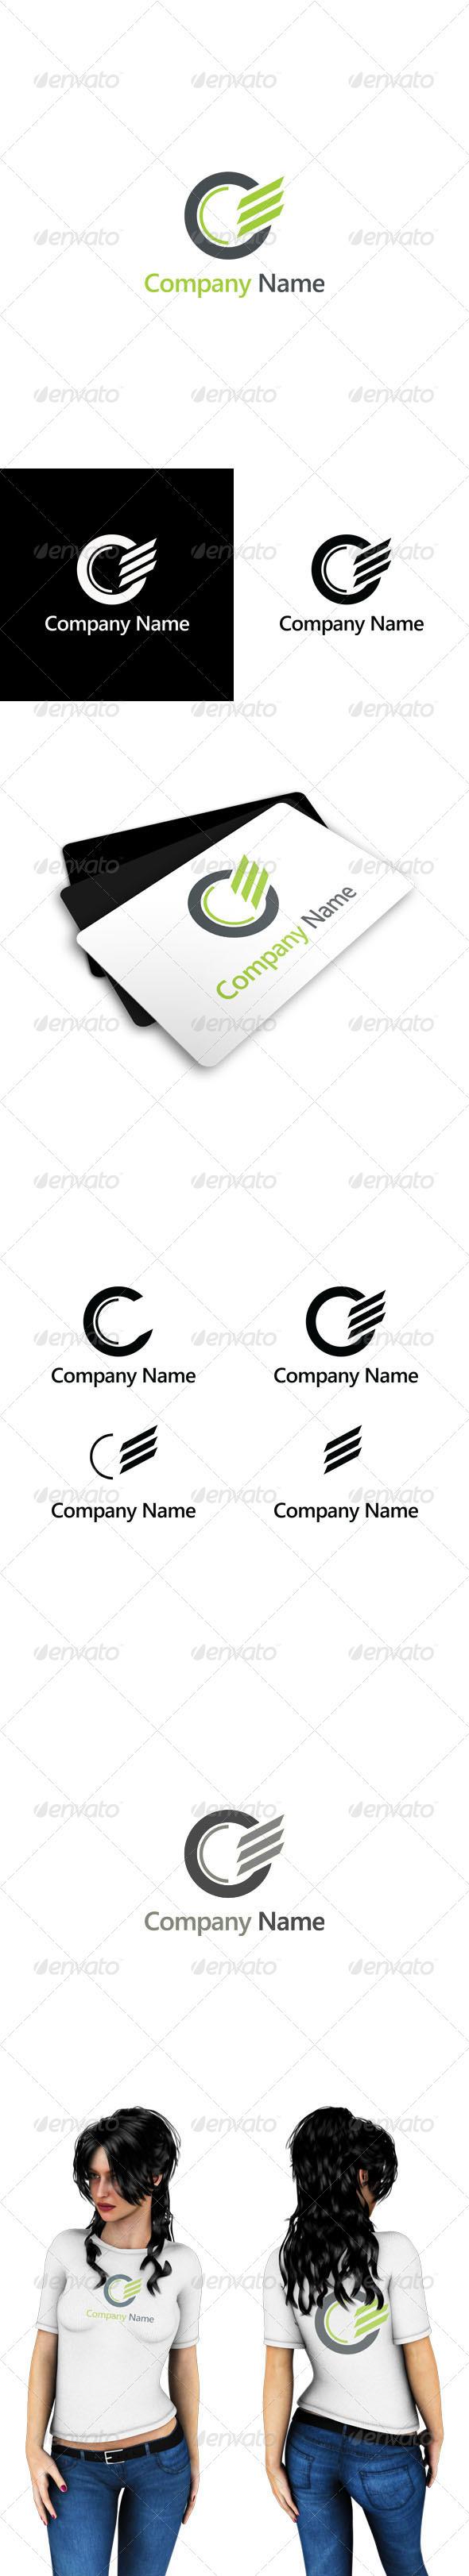 Abstract Logo - 001